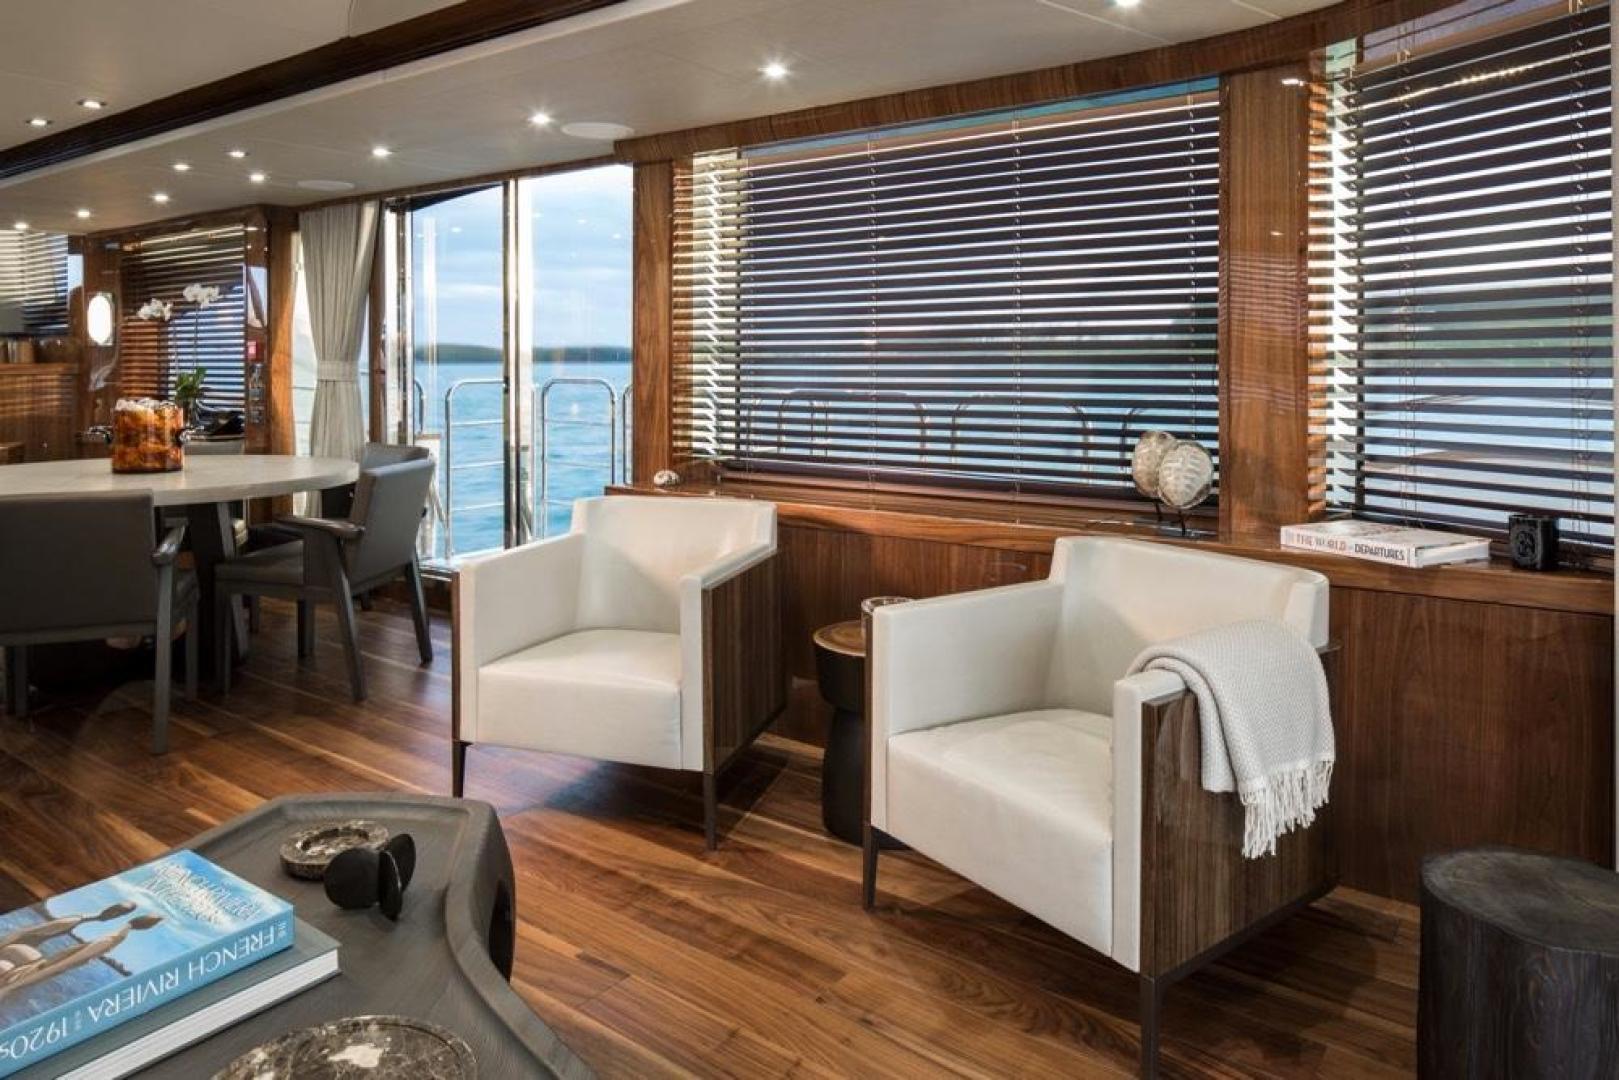 Sunseeker-28 Metre Yacht 2016-RIII Miami-Florida-United States-2016 SUNSEEKER 92 RIII FOR SALE-600096 | Thumbnail